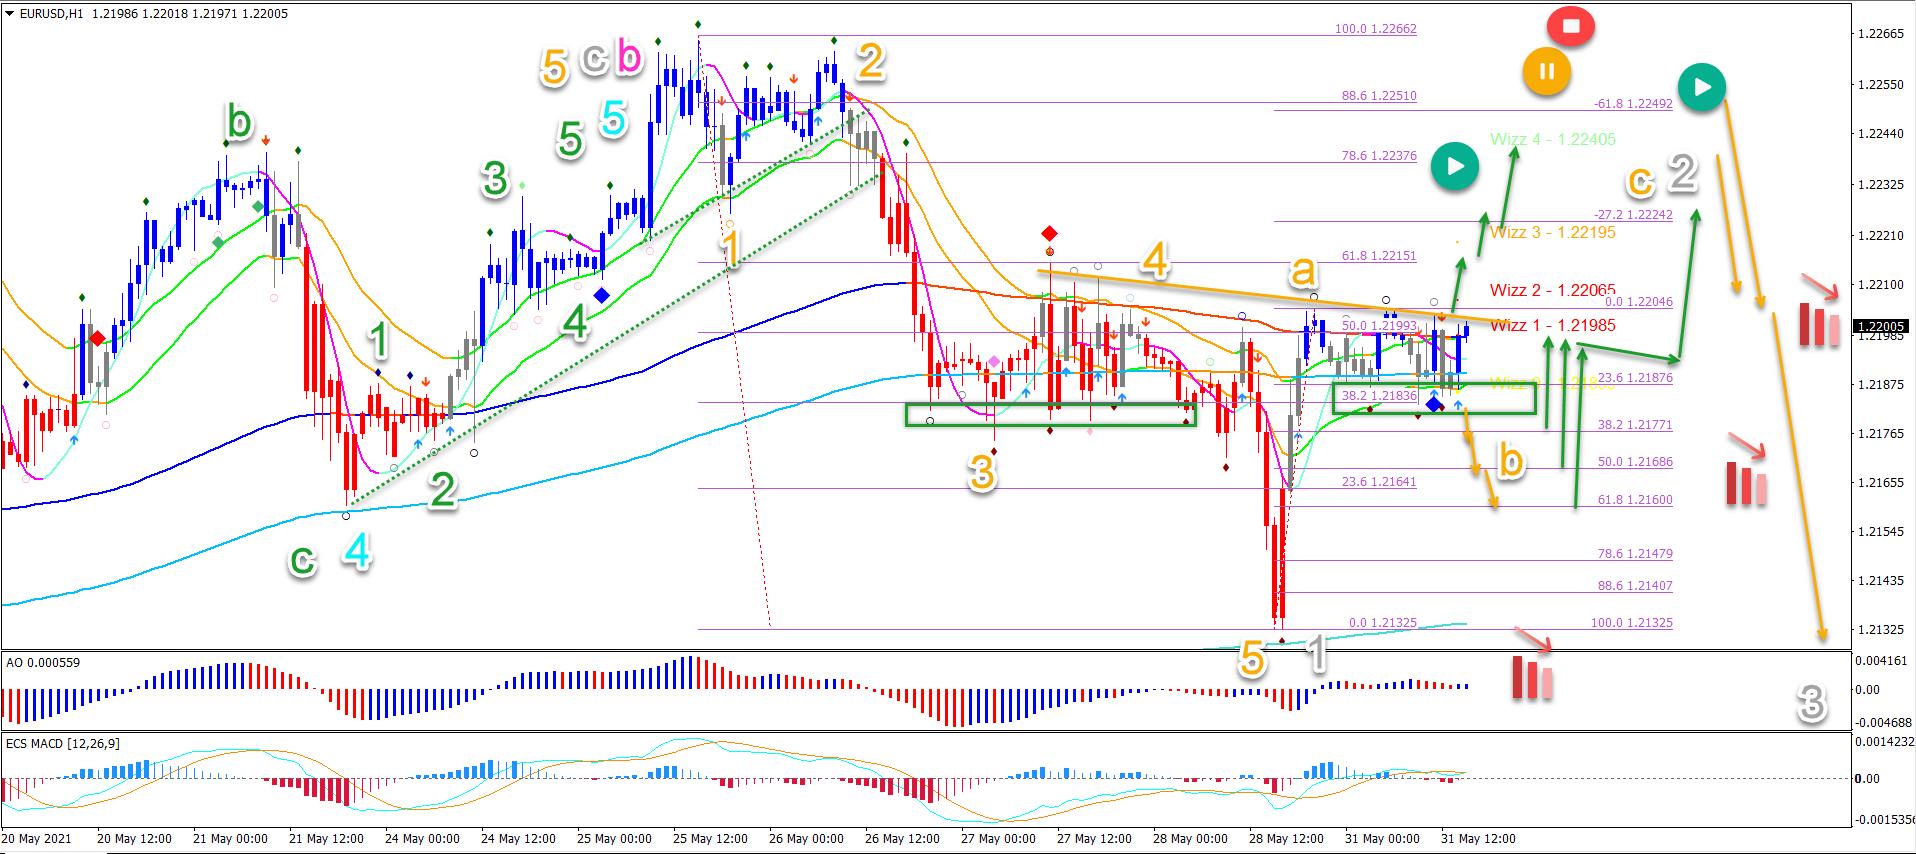 EUR/USD 31.5.2021 1 hour chart